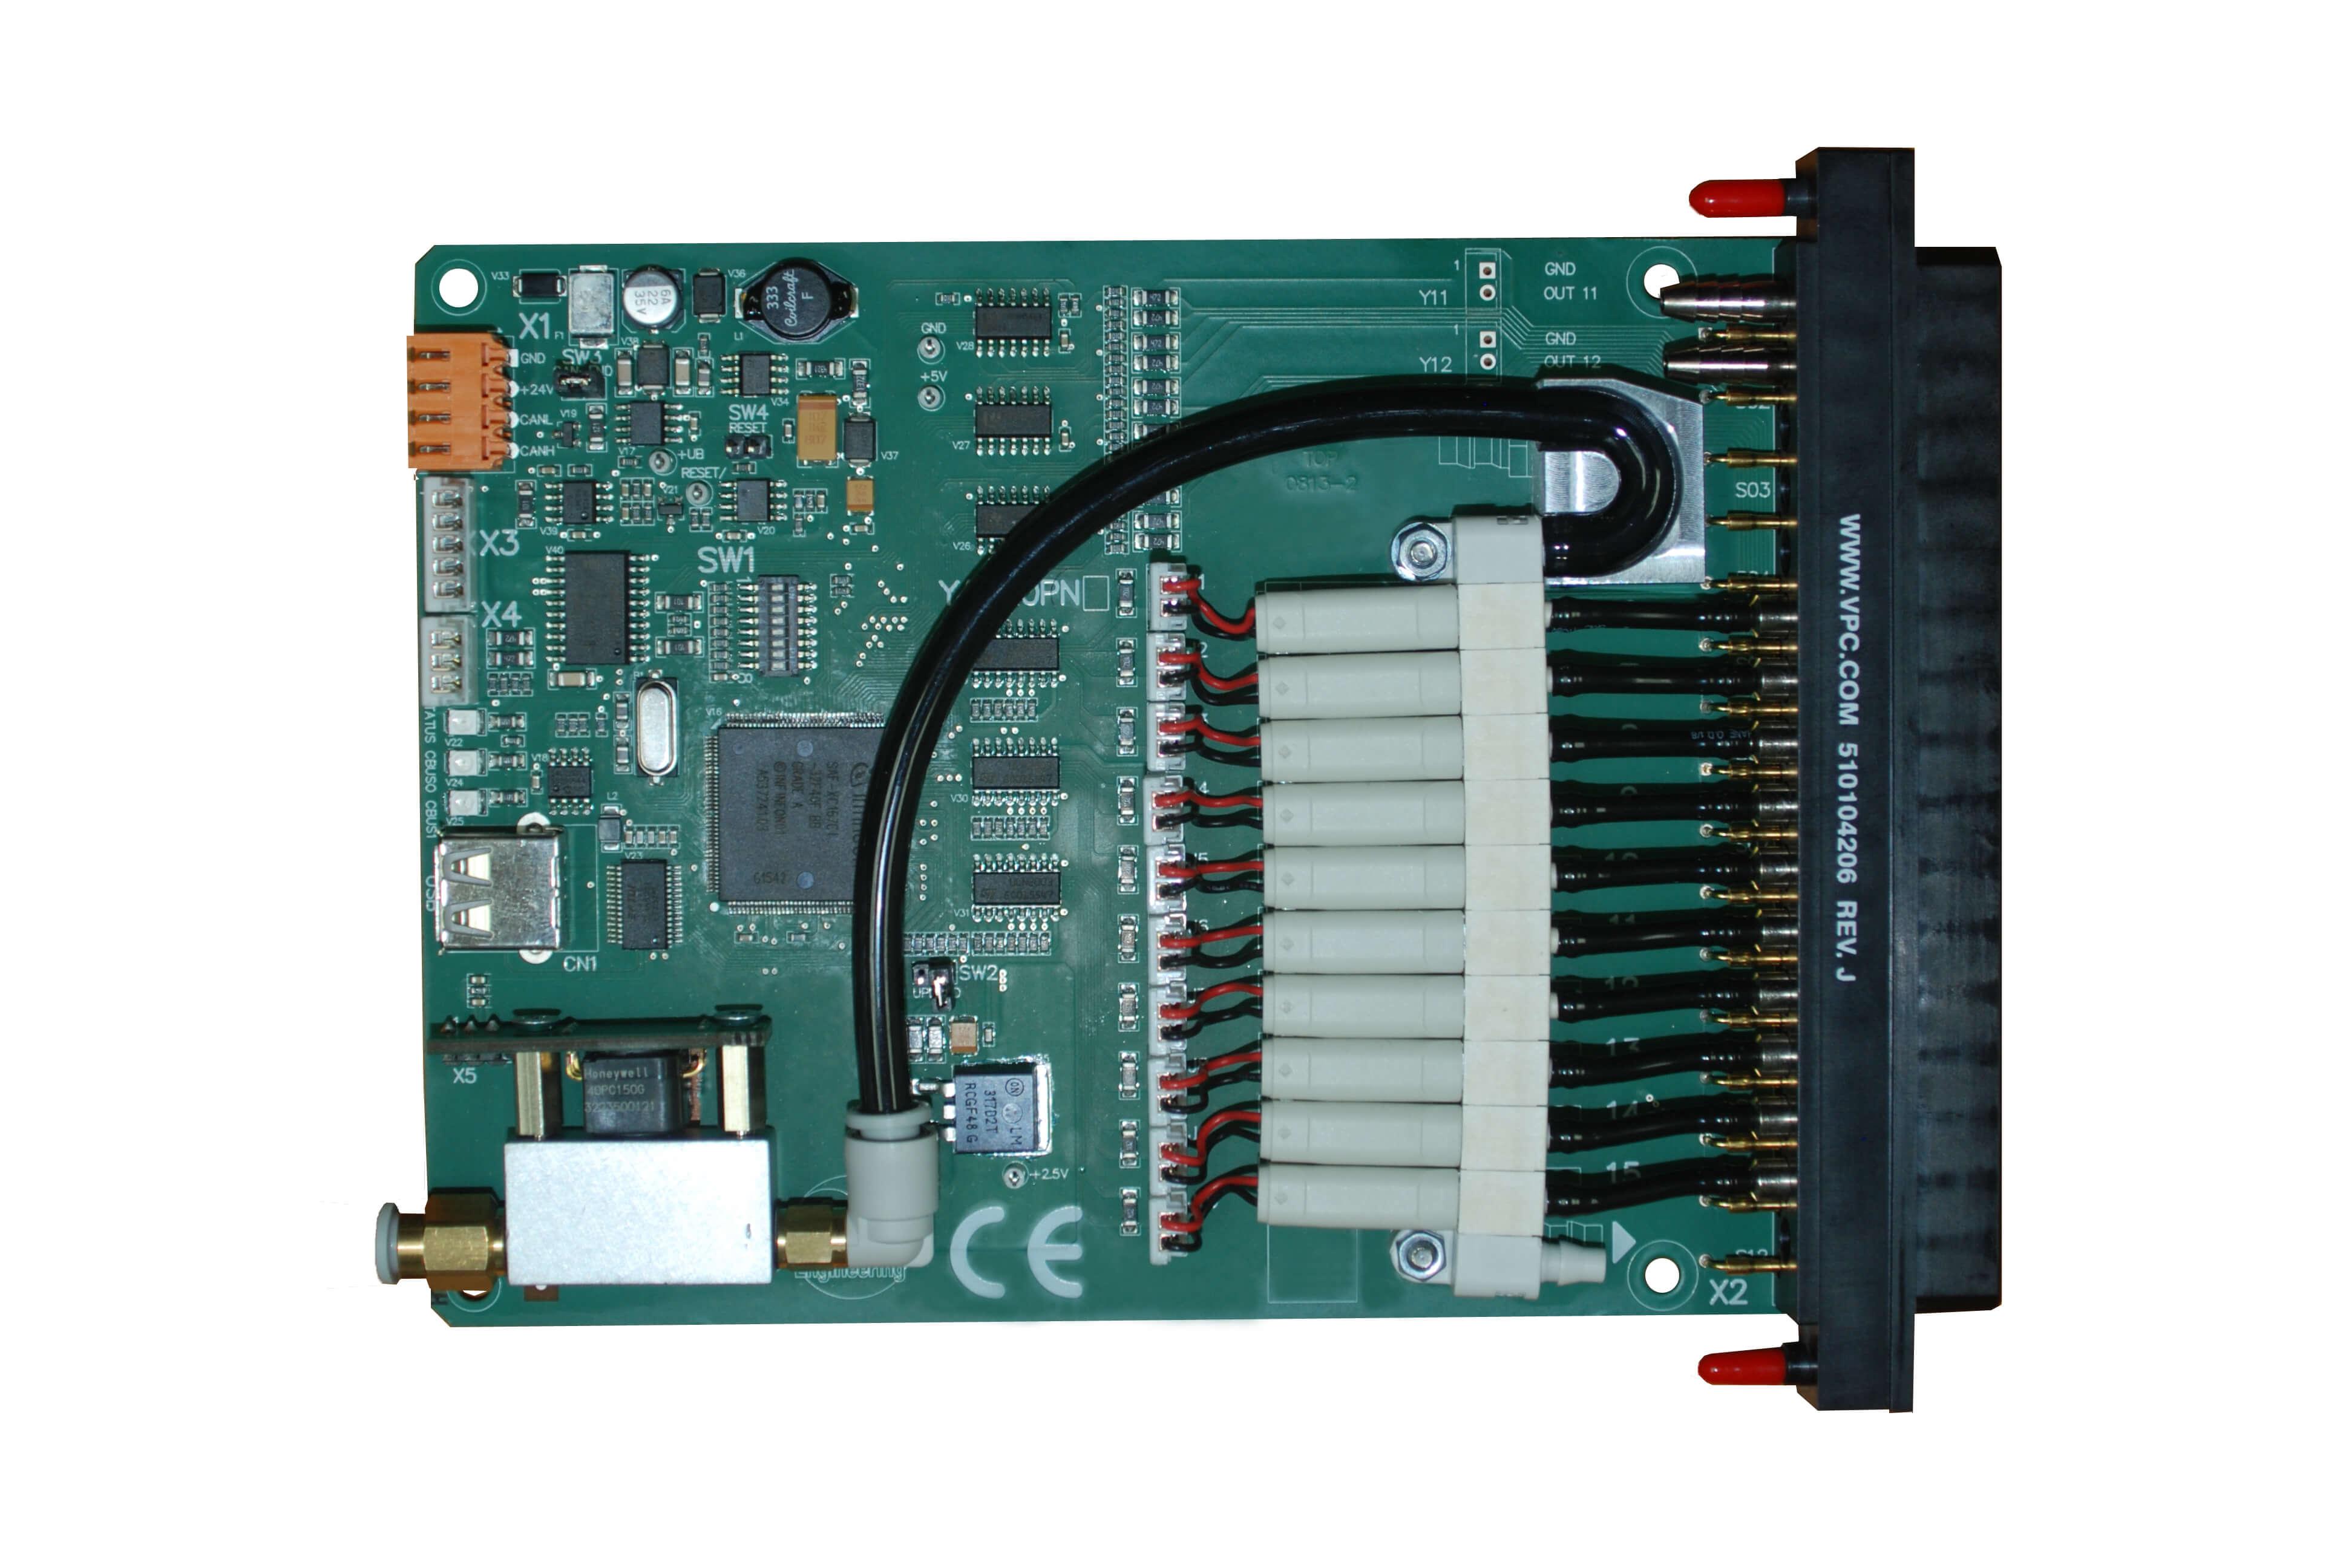 YAV90PNE pneumatic sub system